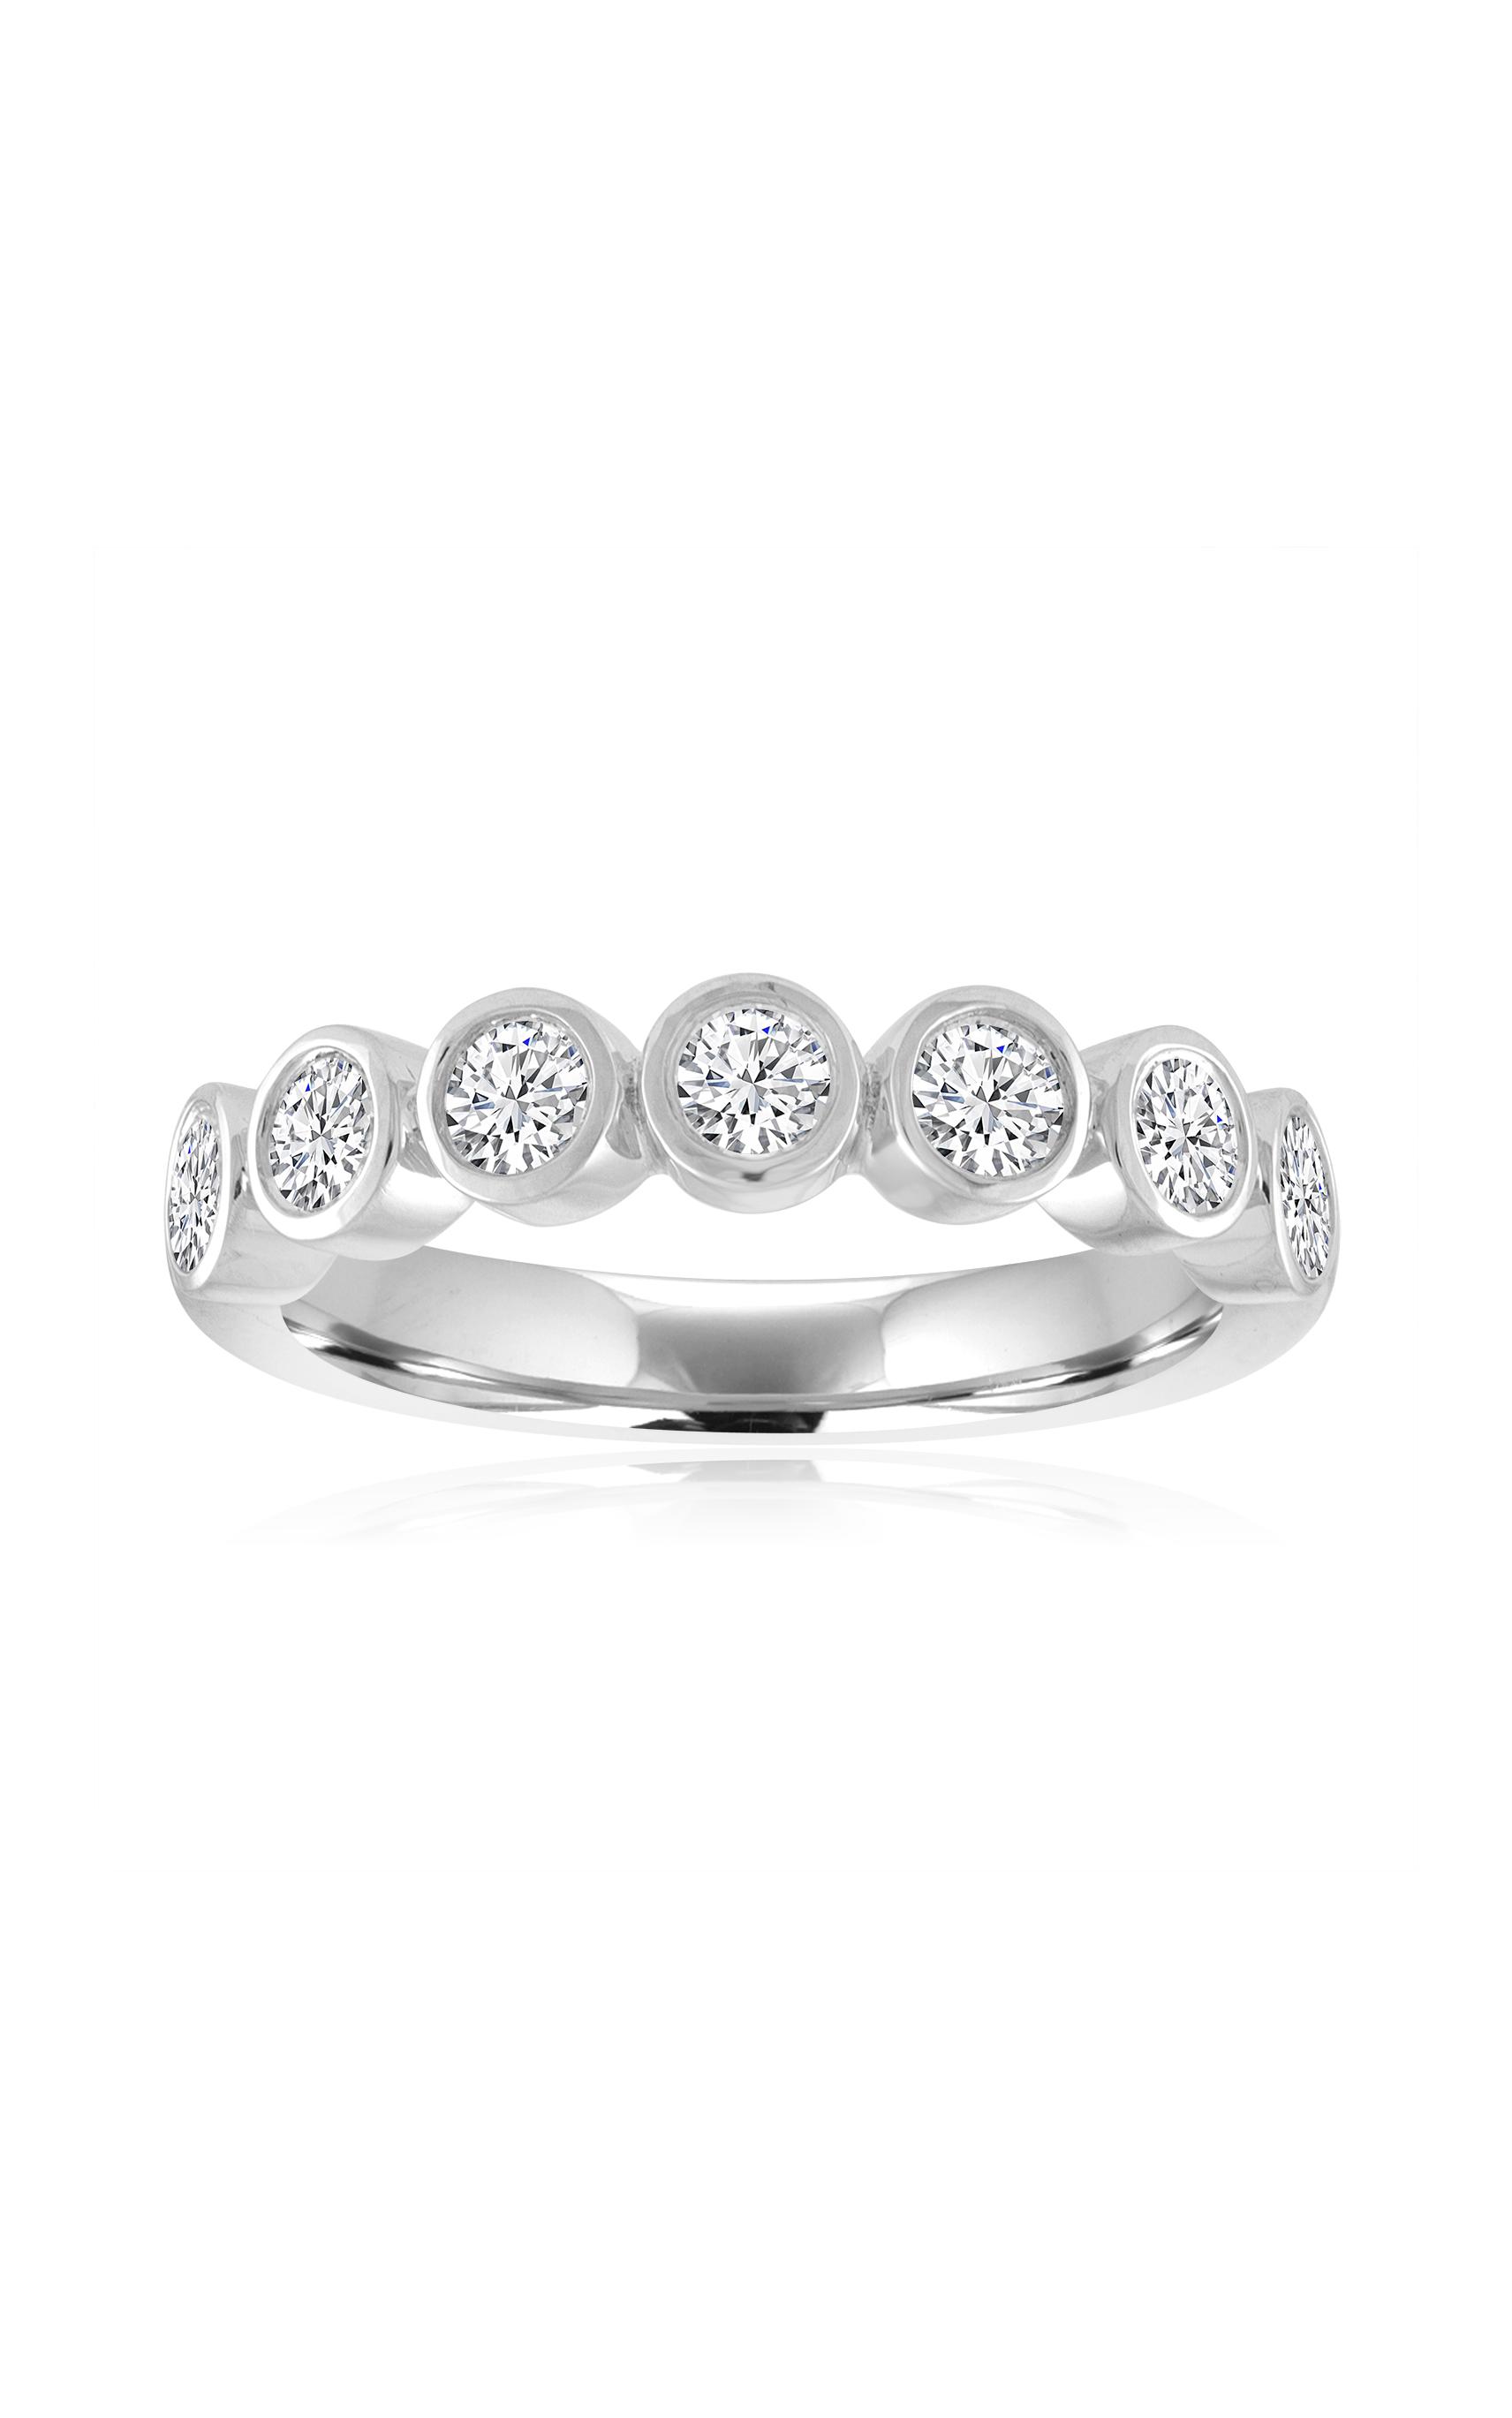 Imagine Bridal Fashion Rings 73106D-1 2 product image